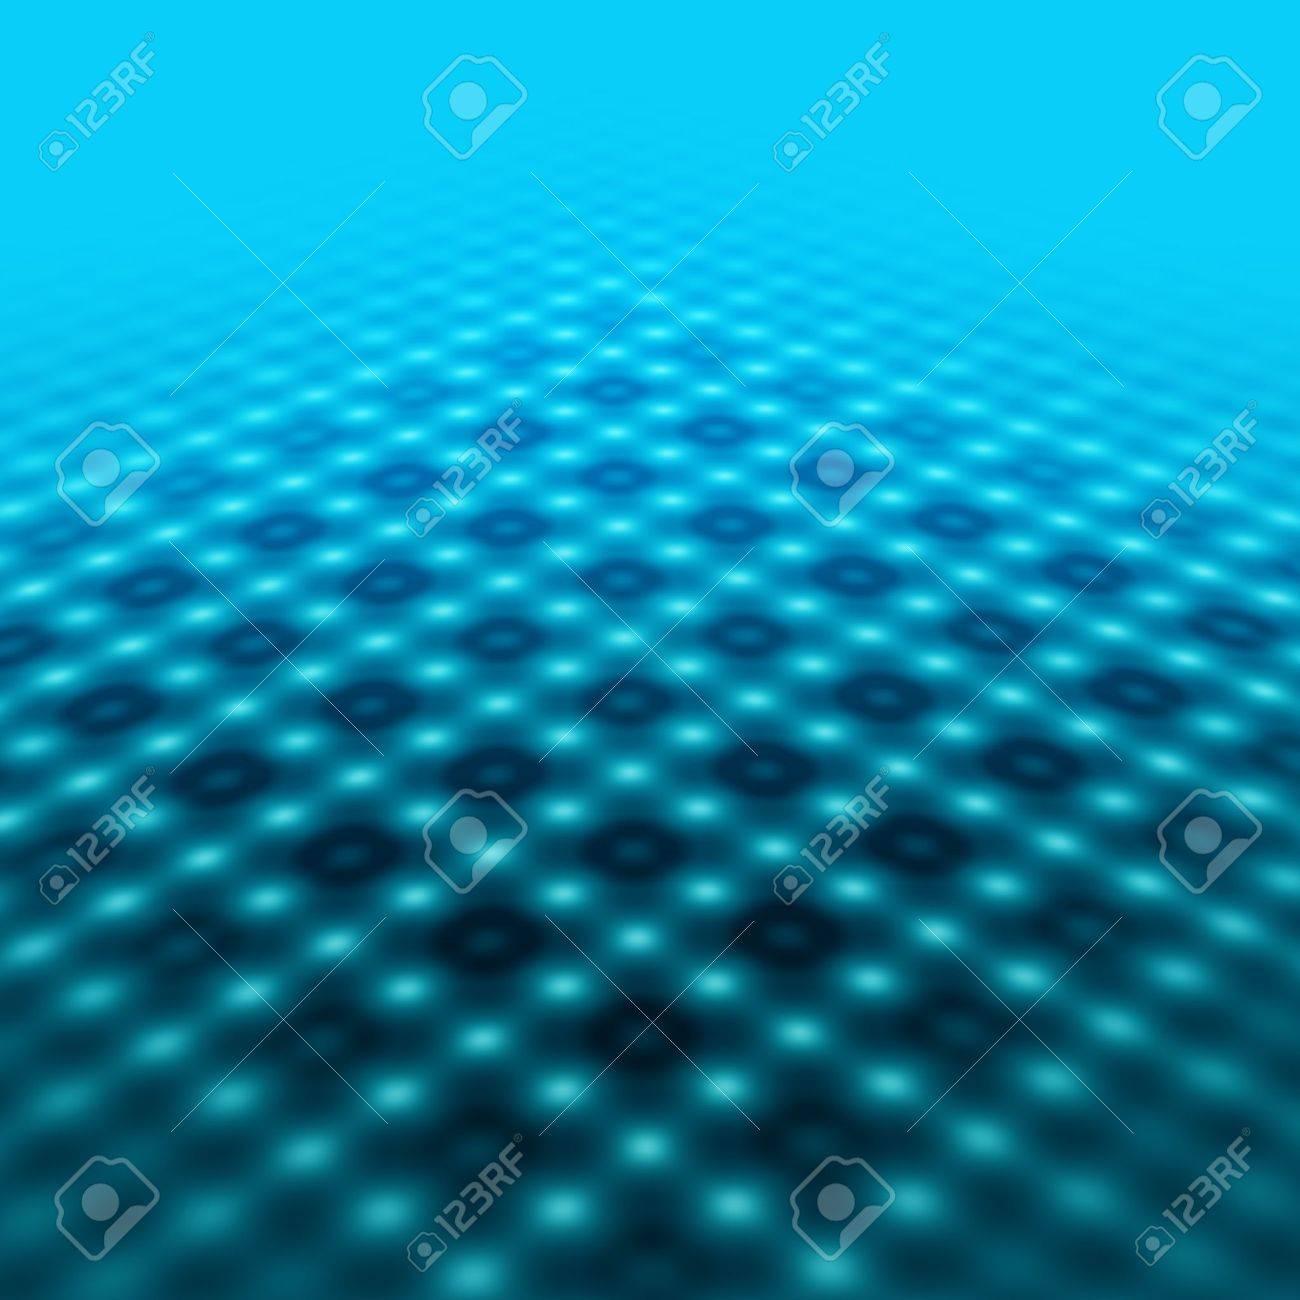 disco dance floor abstract blue background - 12927895